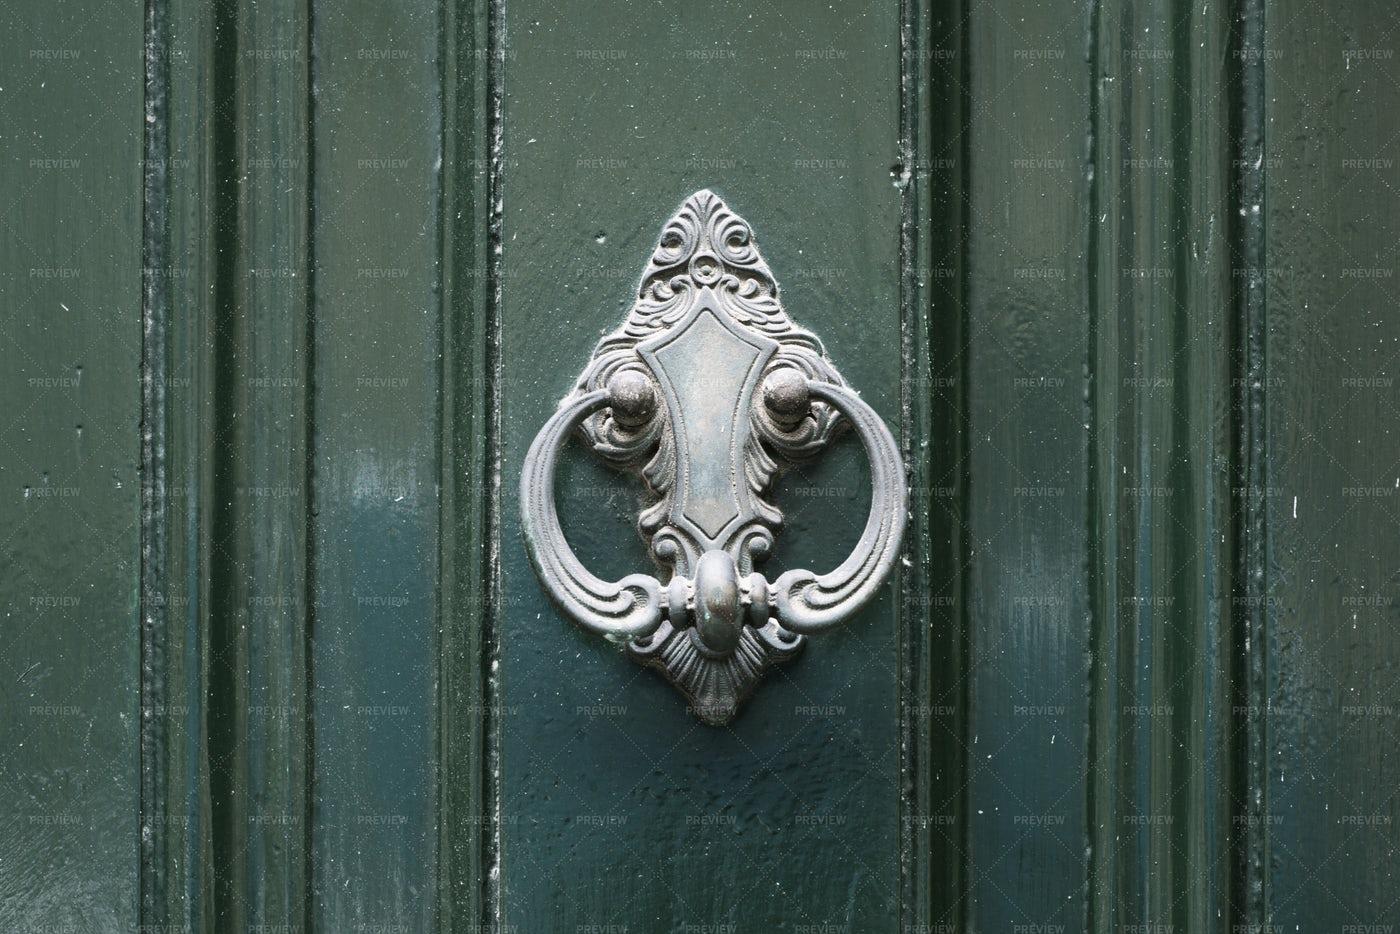 Vintage Antiqued Door Knocker: Stock Photos